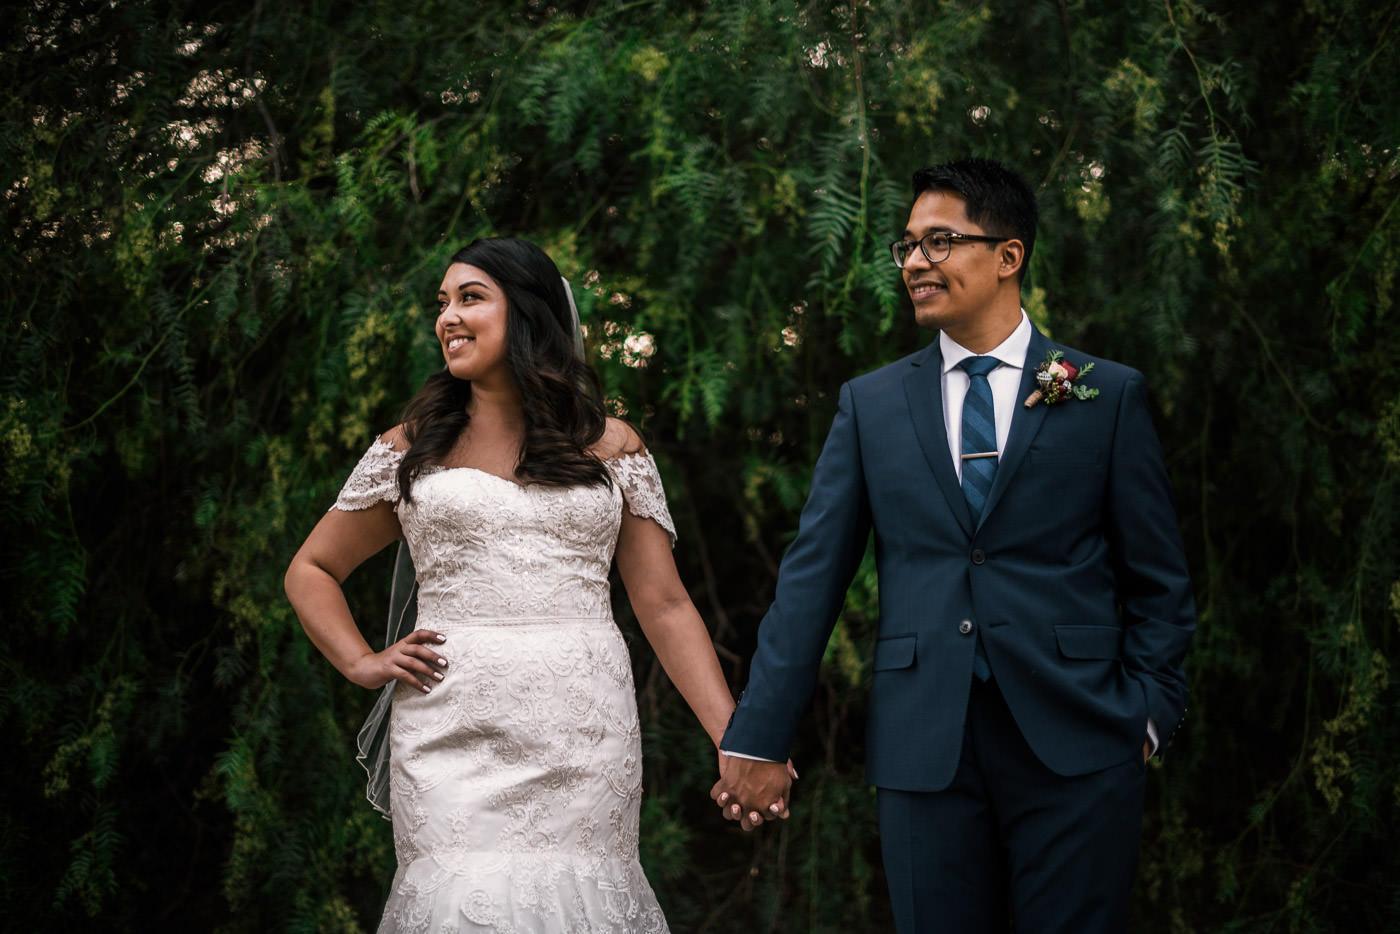 Knollwood Country Club wedding photographer in Granada Hills.